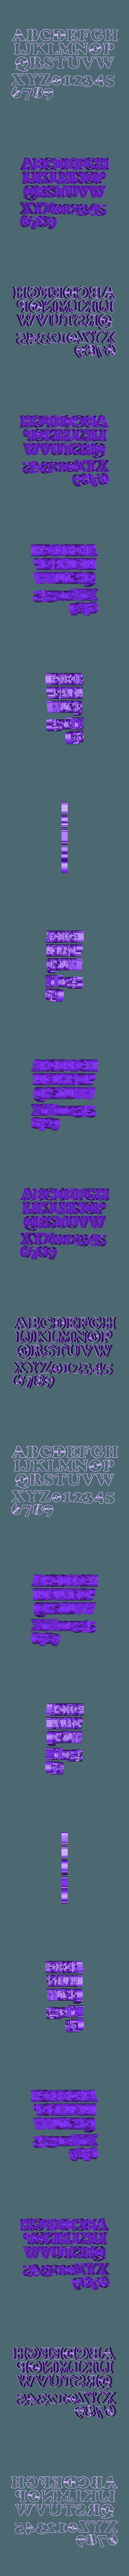 abc cooper 2cm.stl Download free STL file ABC + NUM 2CM Cooper Cookie cutter • 3D printable design, CutterLabs